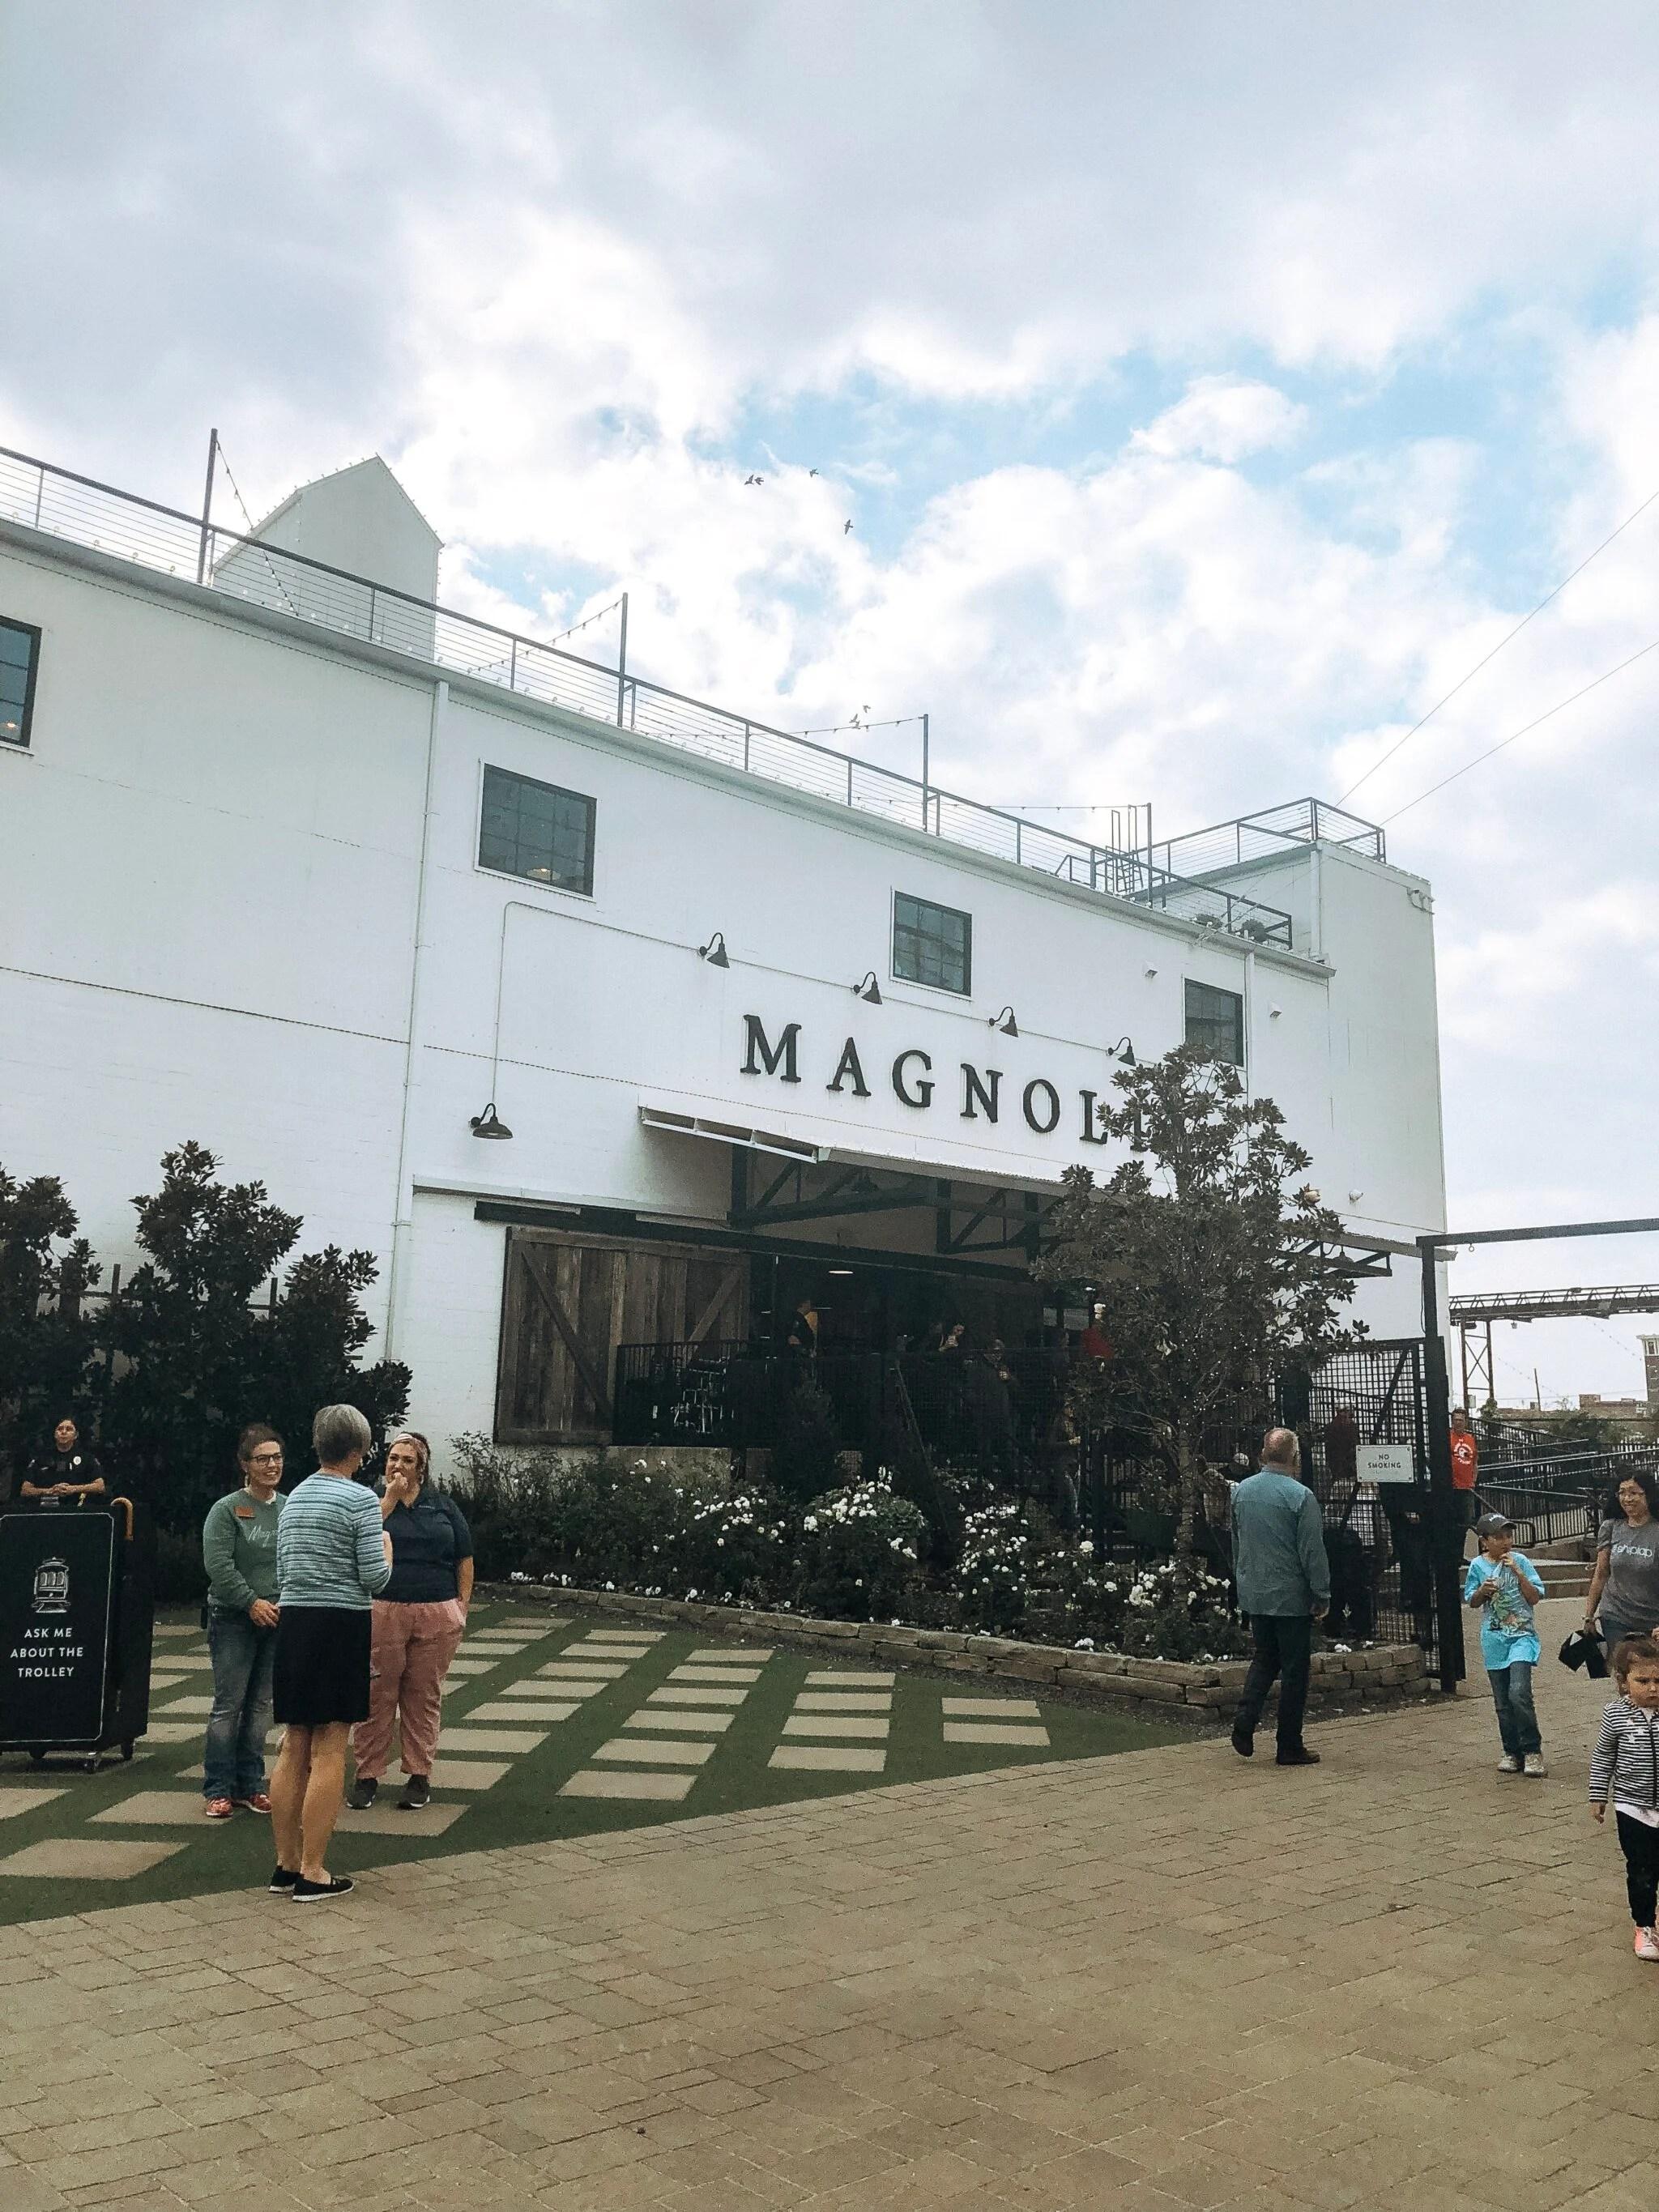 hotels in Waco tx near magnolia market